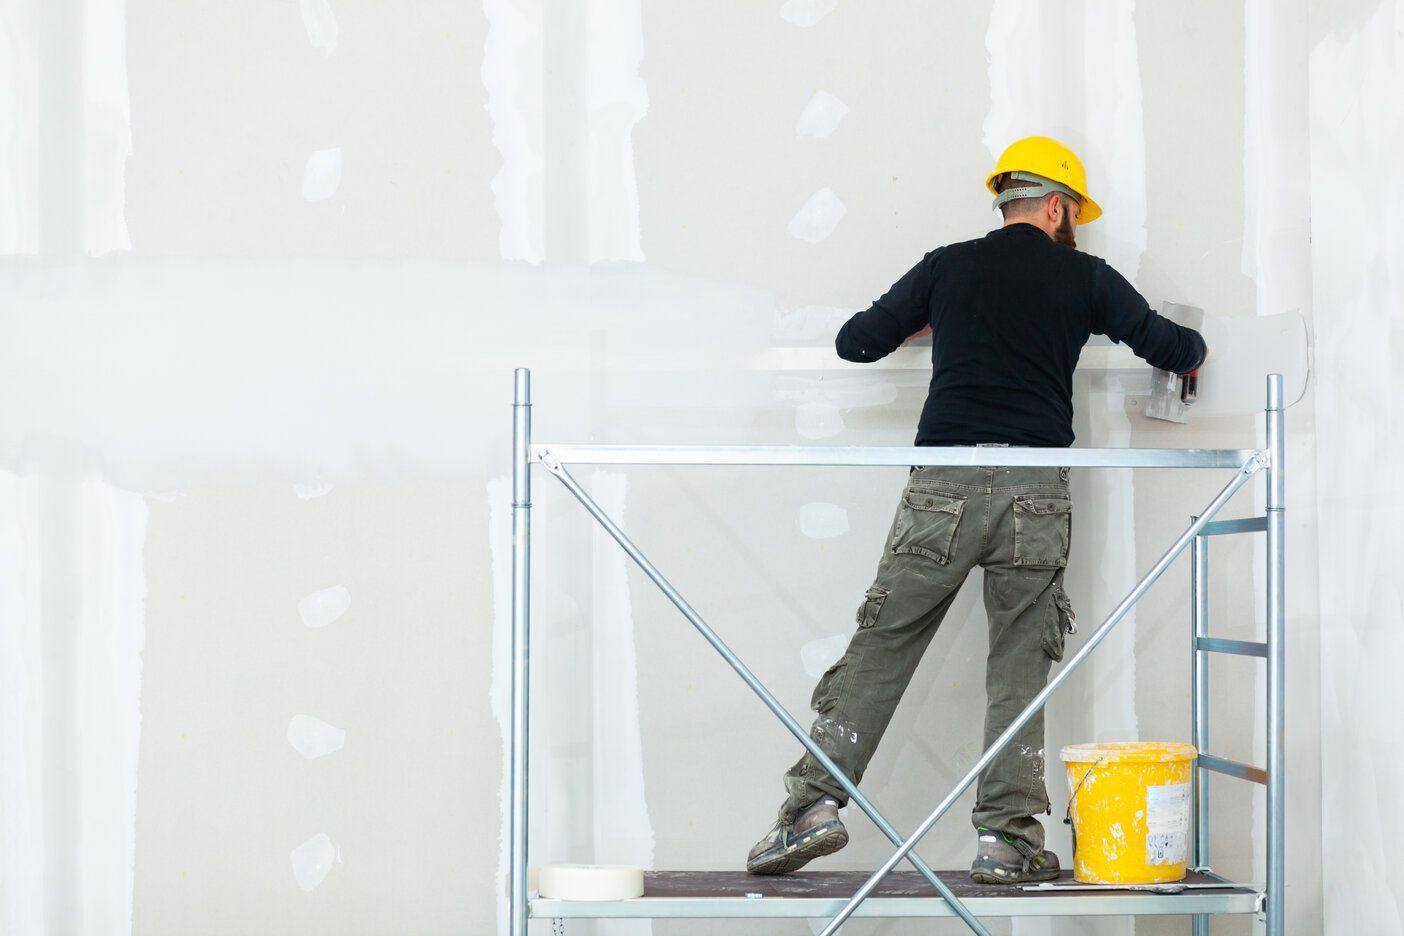 stucco plastering